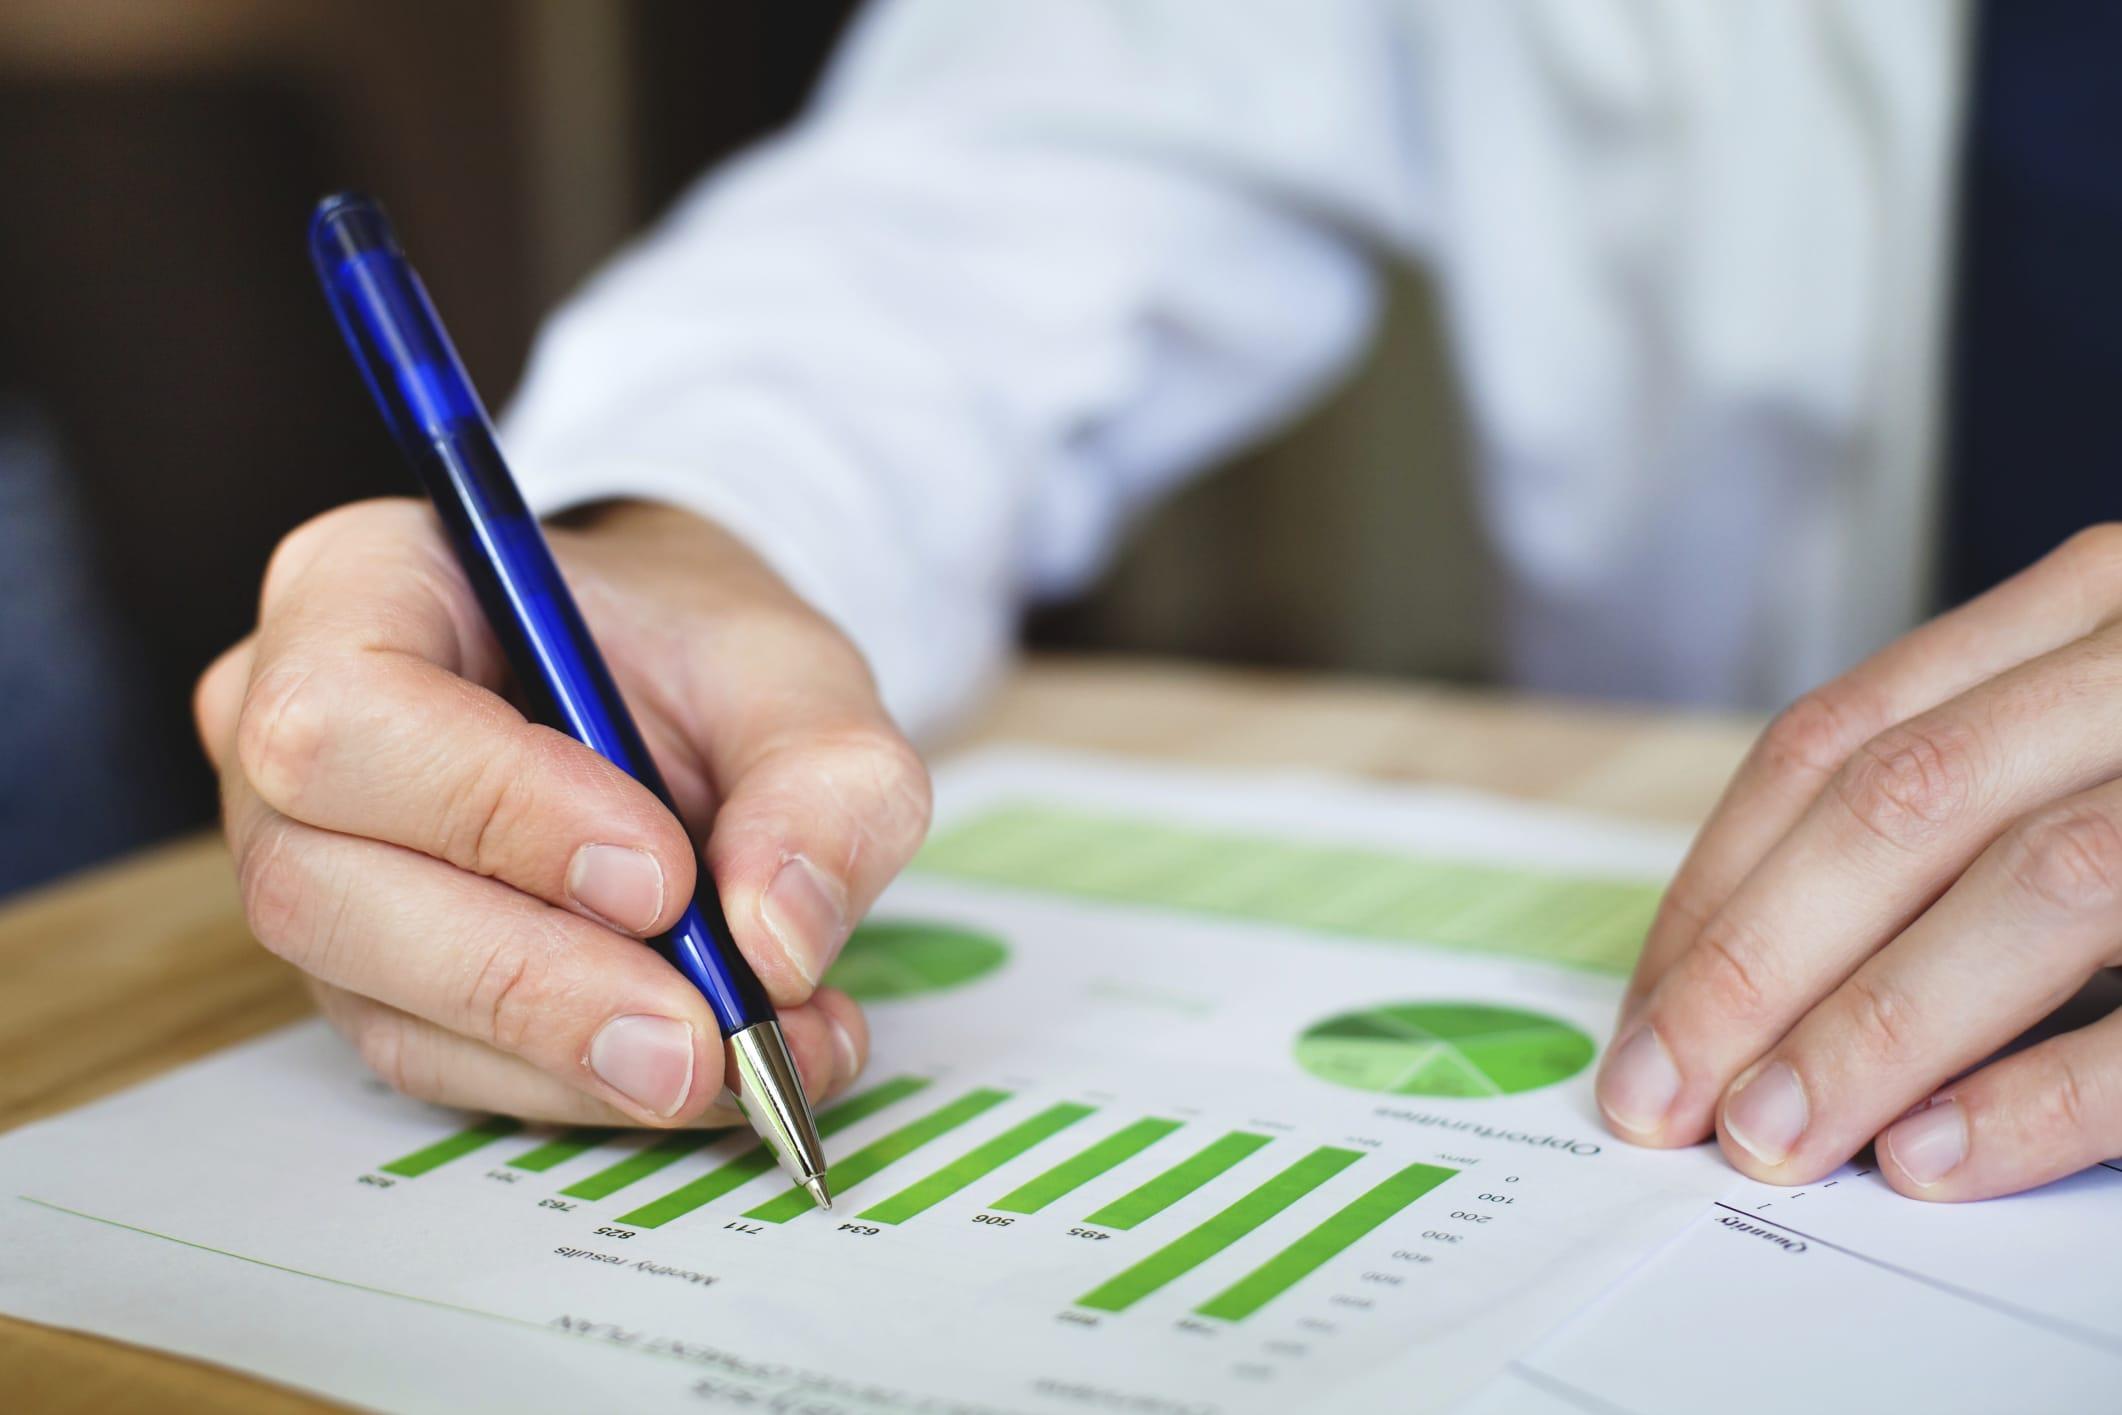 Diagnosi energetica aziendale: la start up The energy school